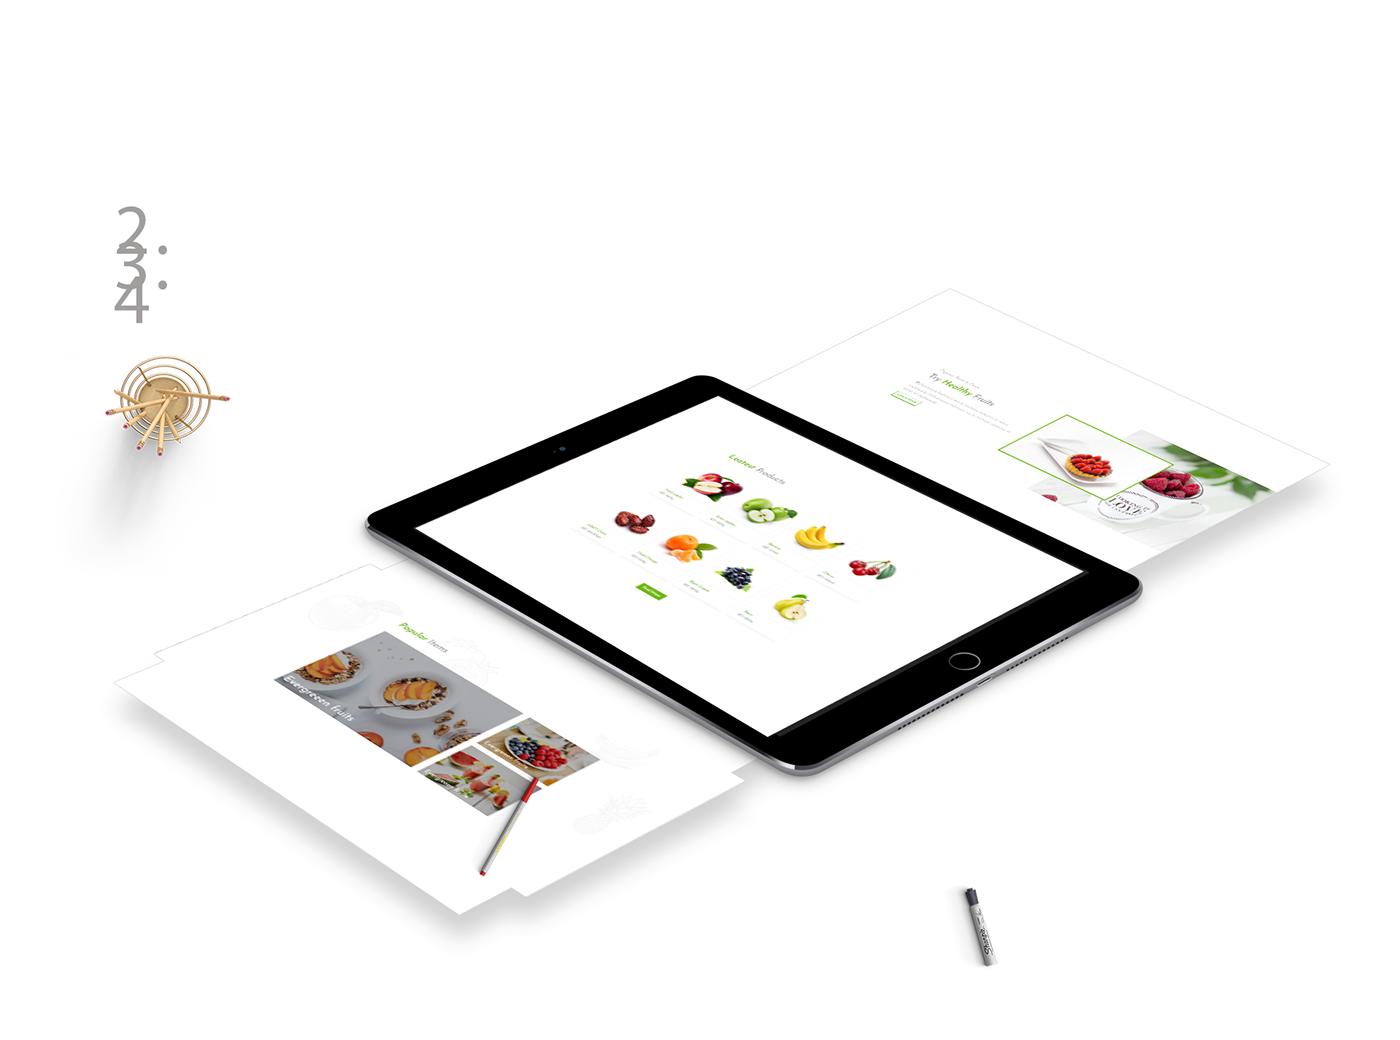 Web Design  fruits website Web Template E COMMERCE Shopping business minimalistic branding  Creative Design